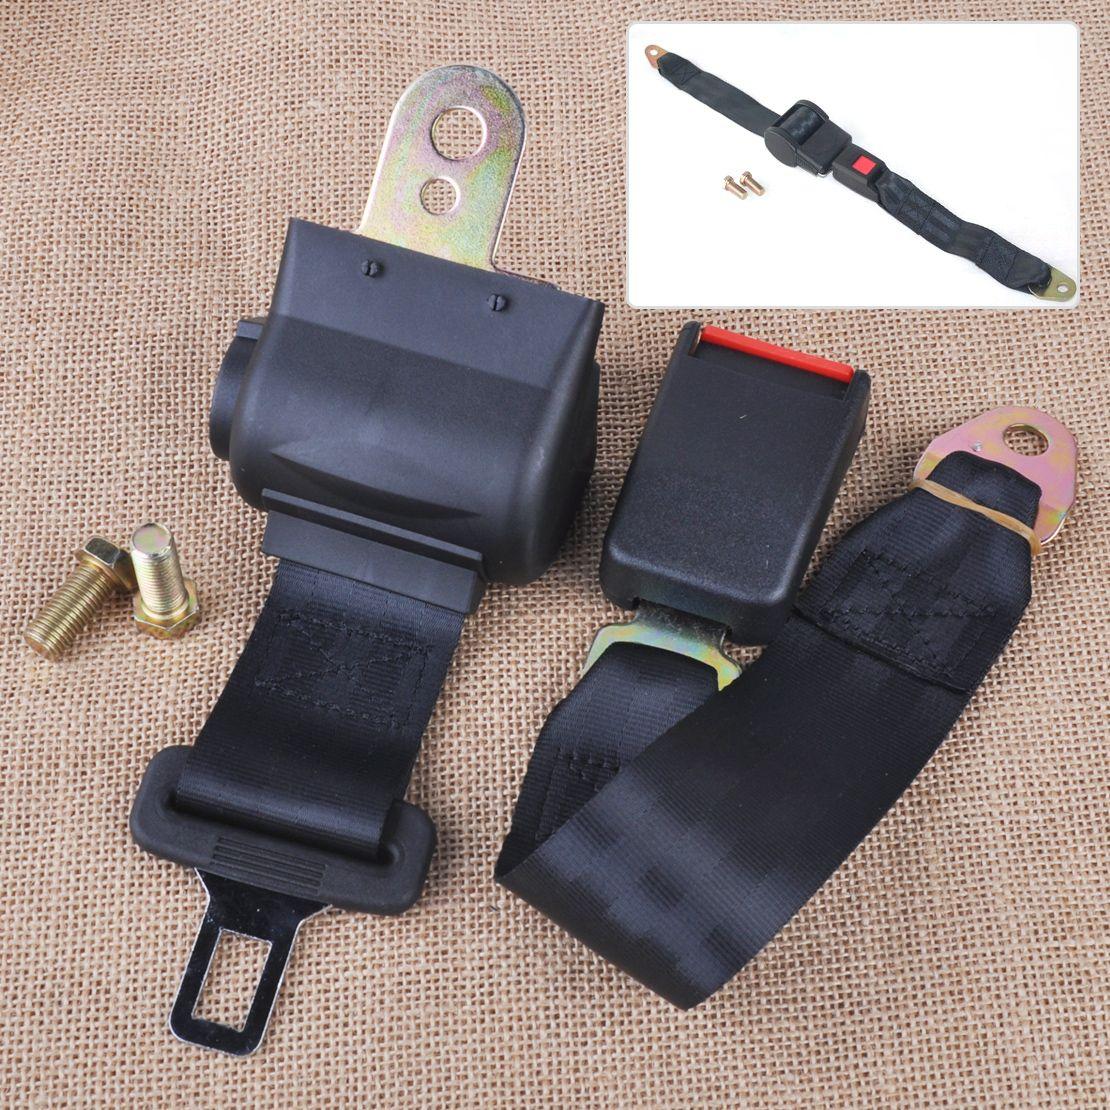 CITALL Universal Black 2 Point RetractableCar Auto Seat Safety Lap Belt Strap Buckle Adjustable Security Belt